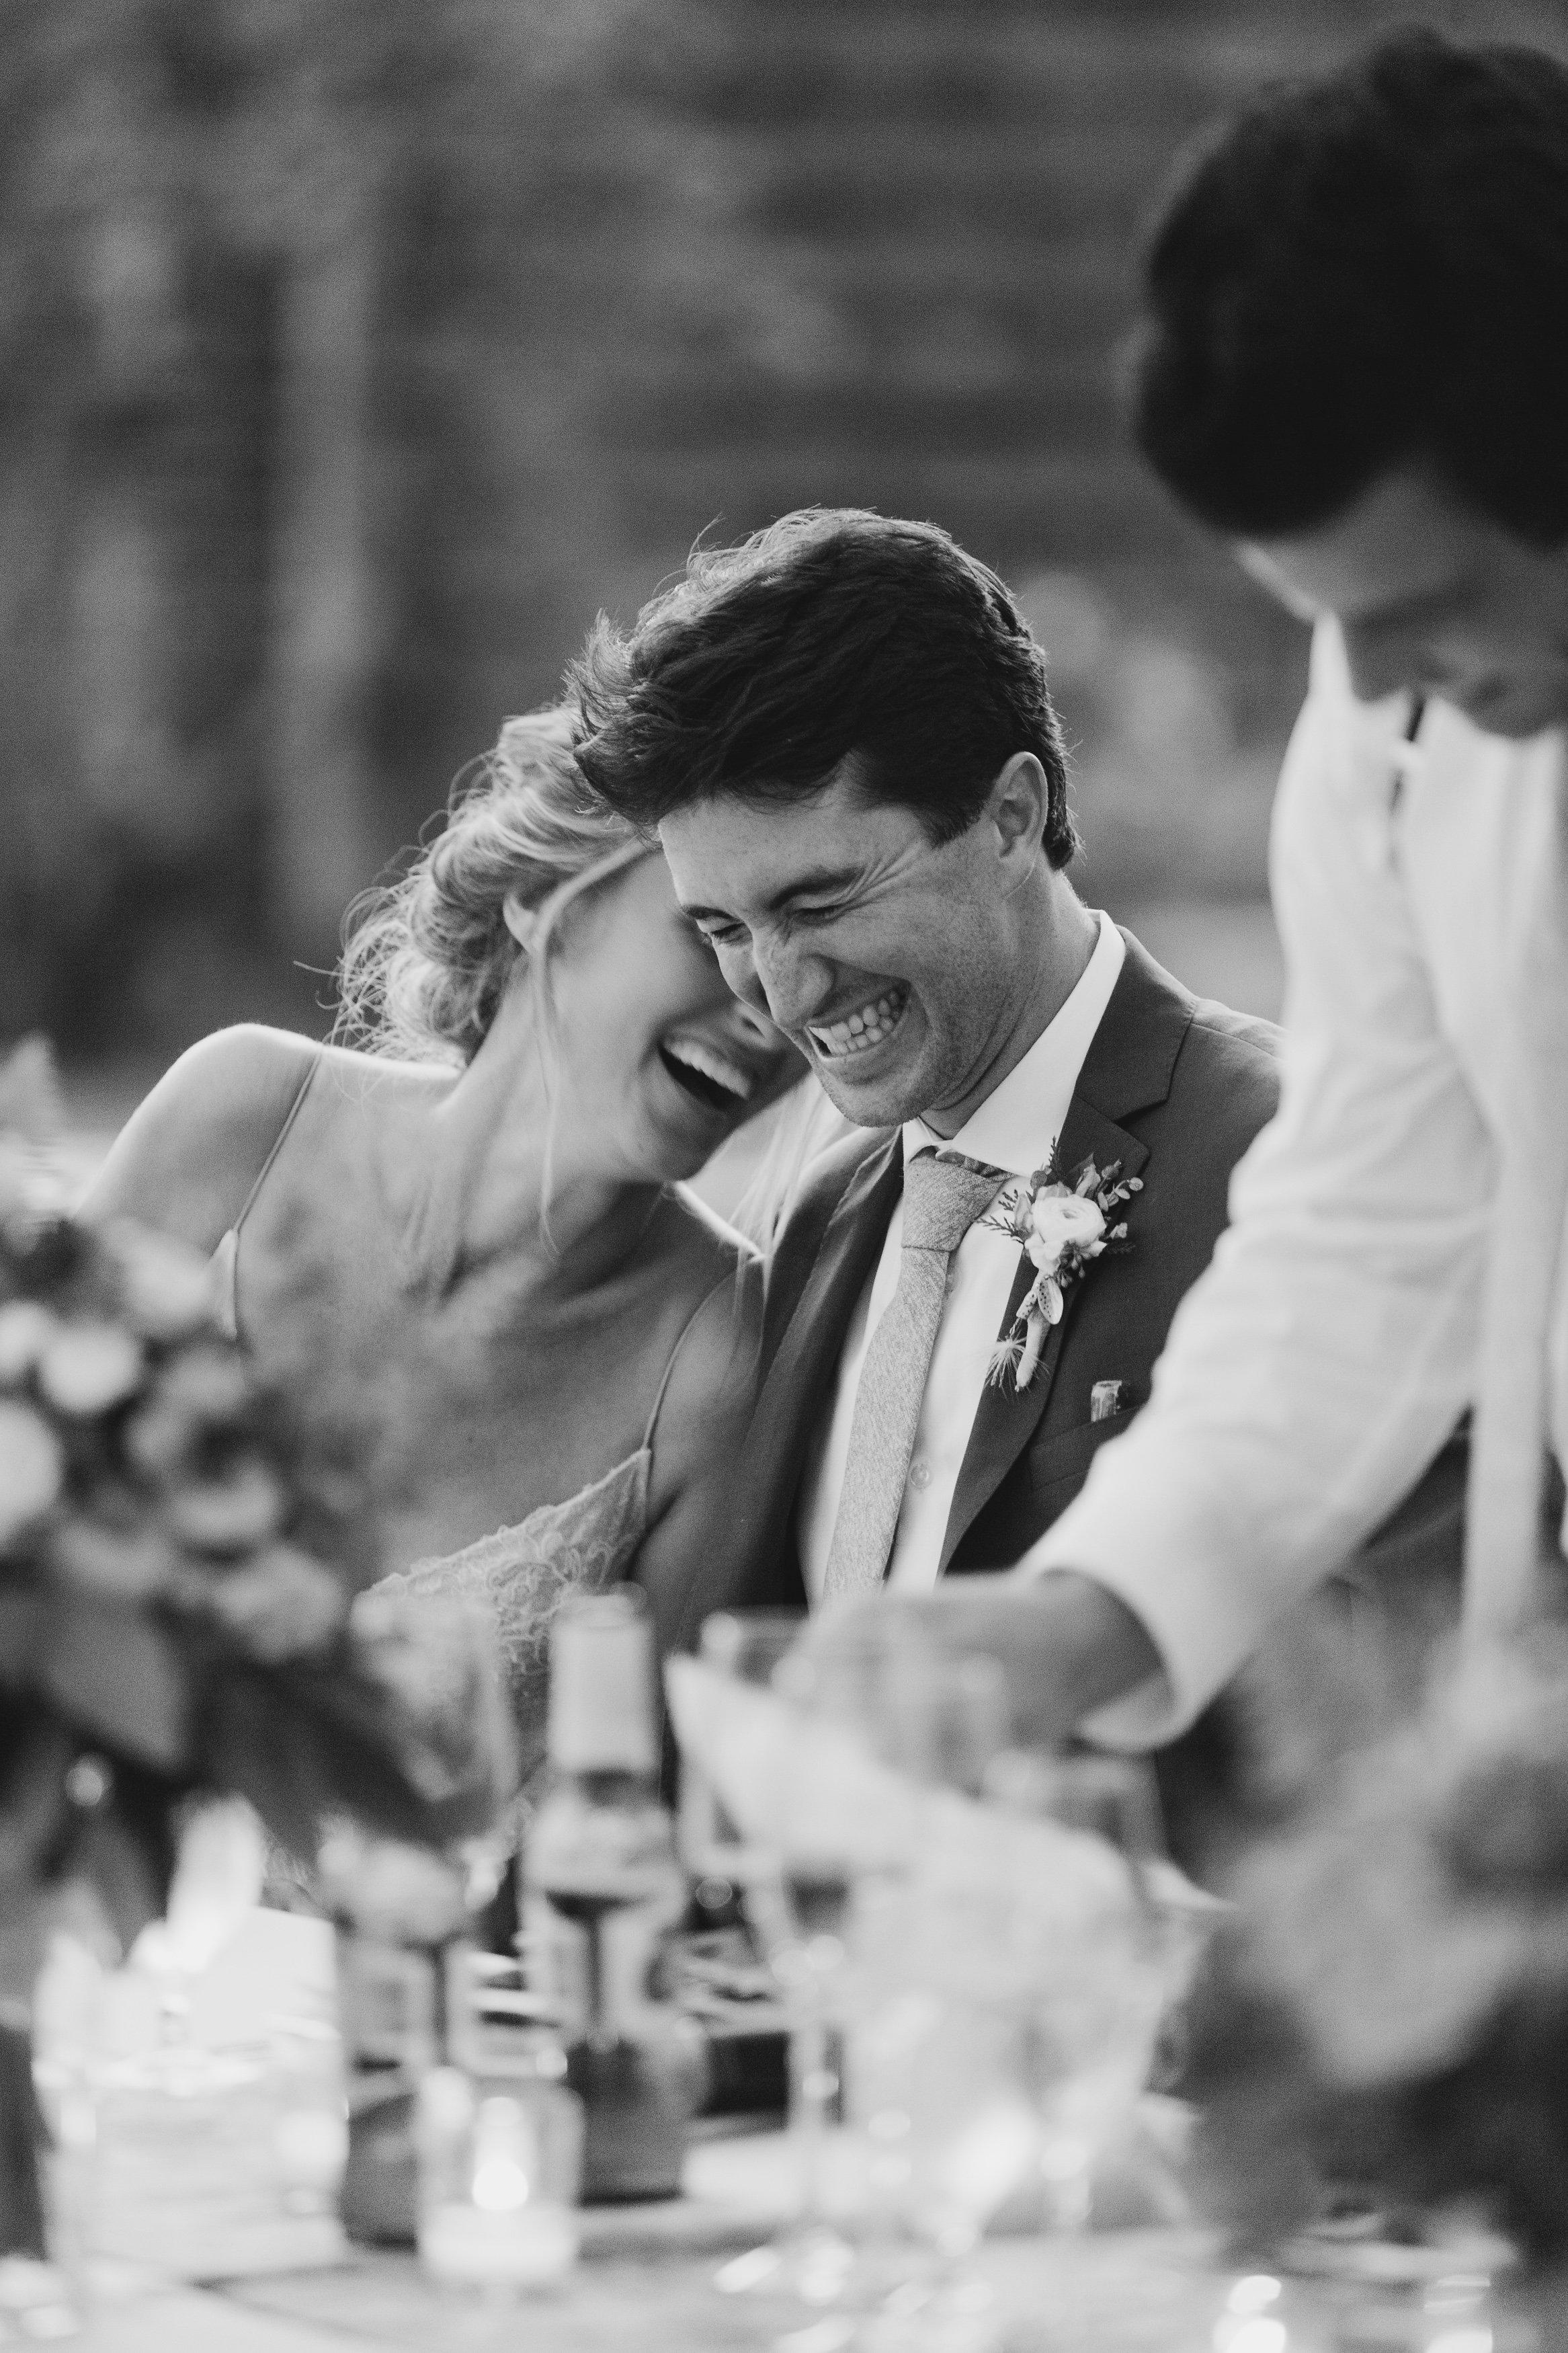 brandon-lindsey-married-169